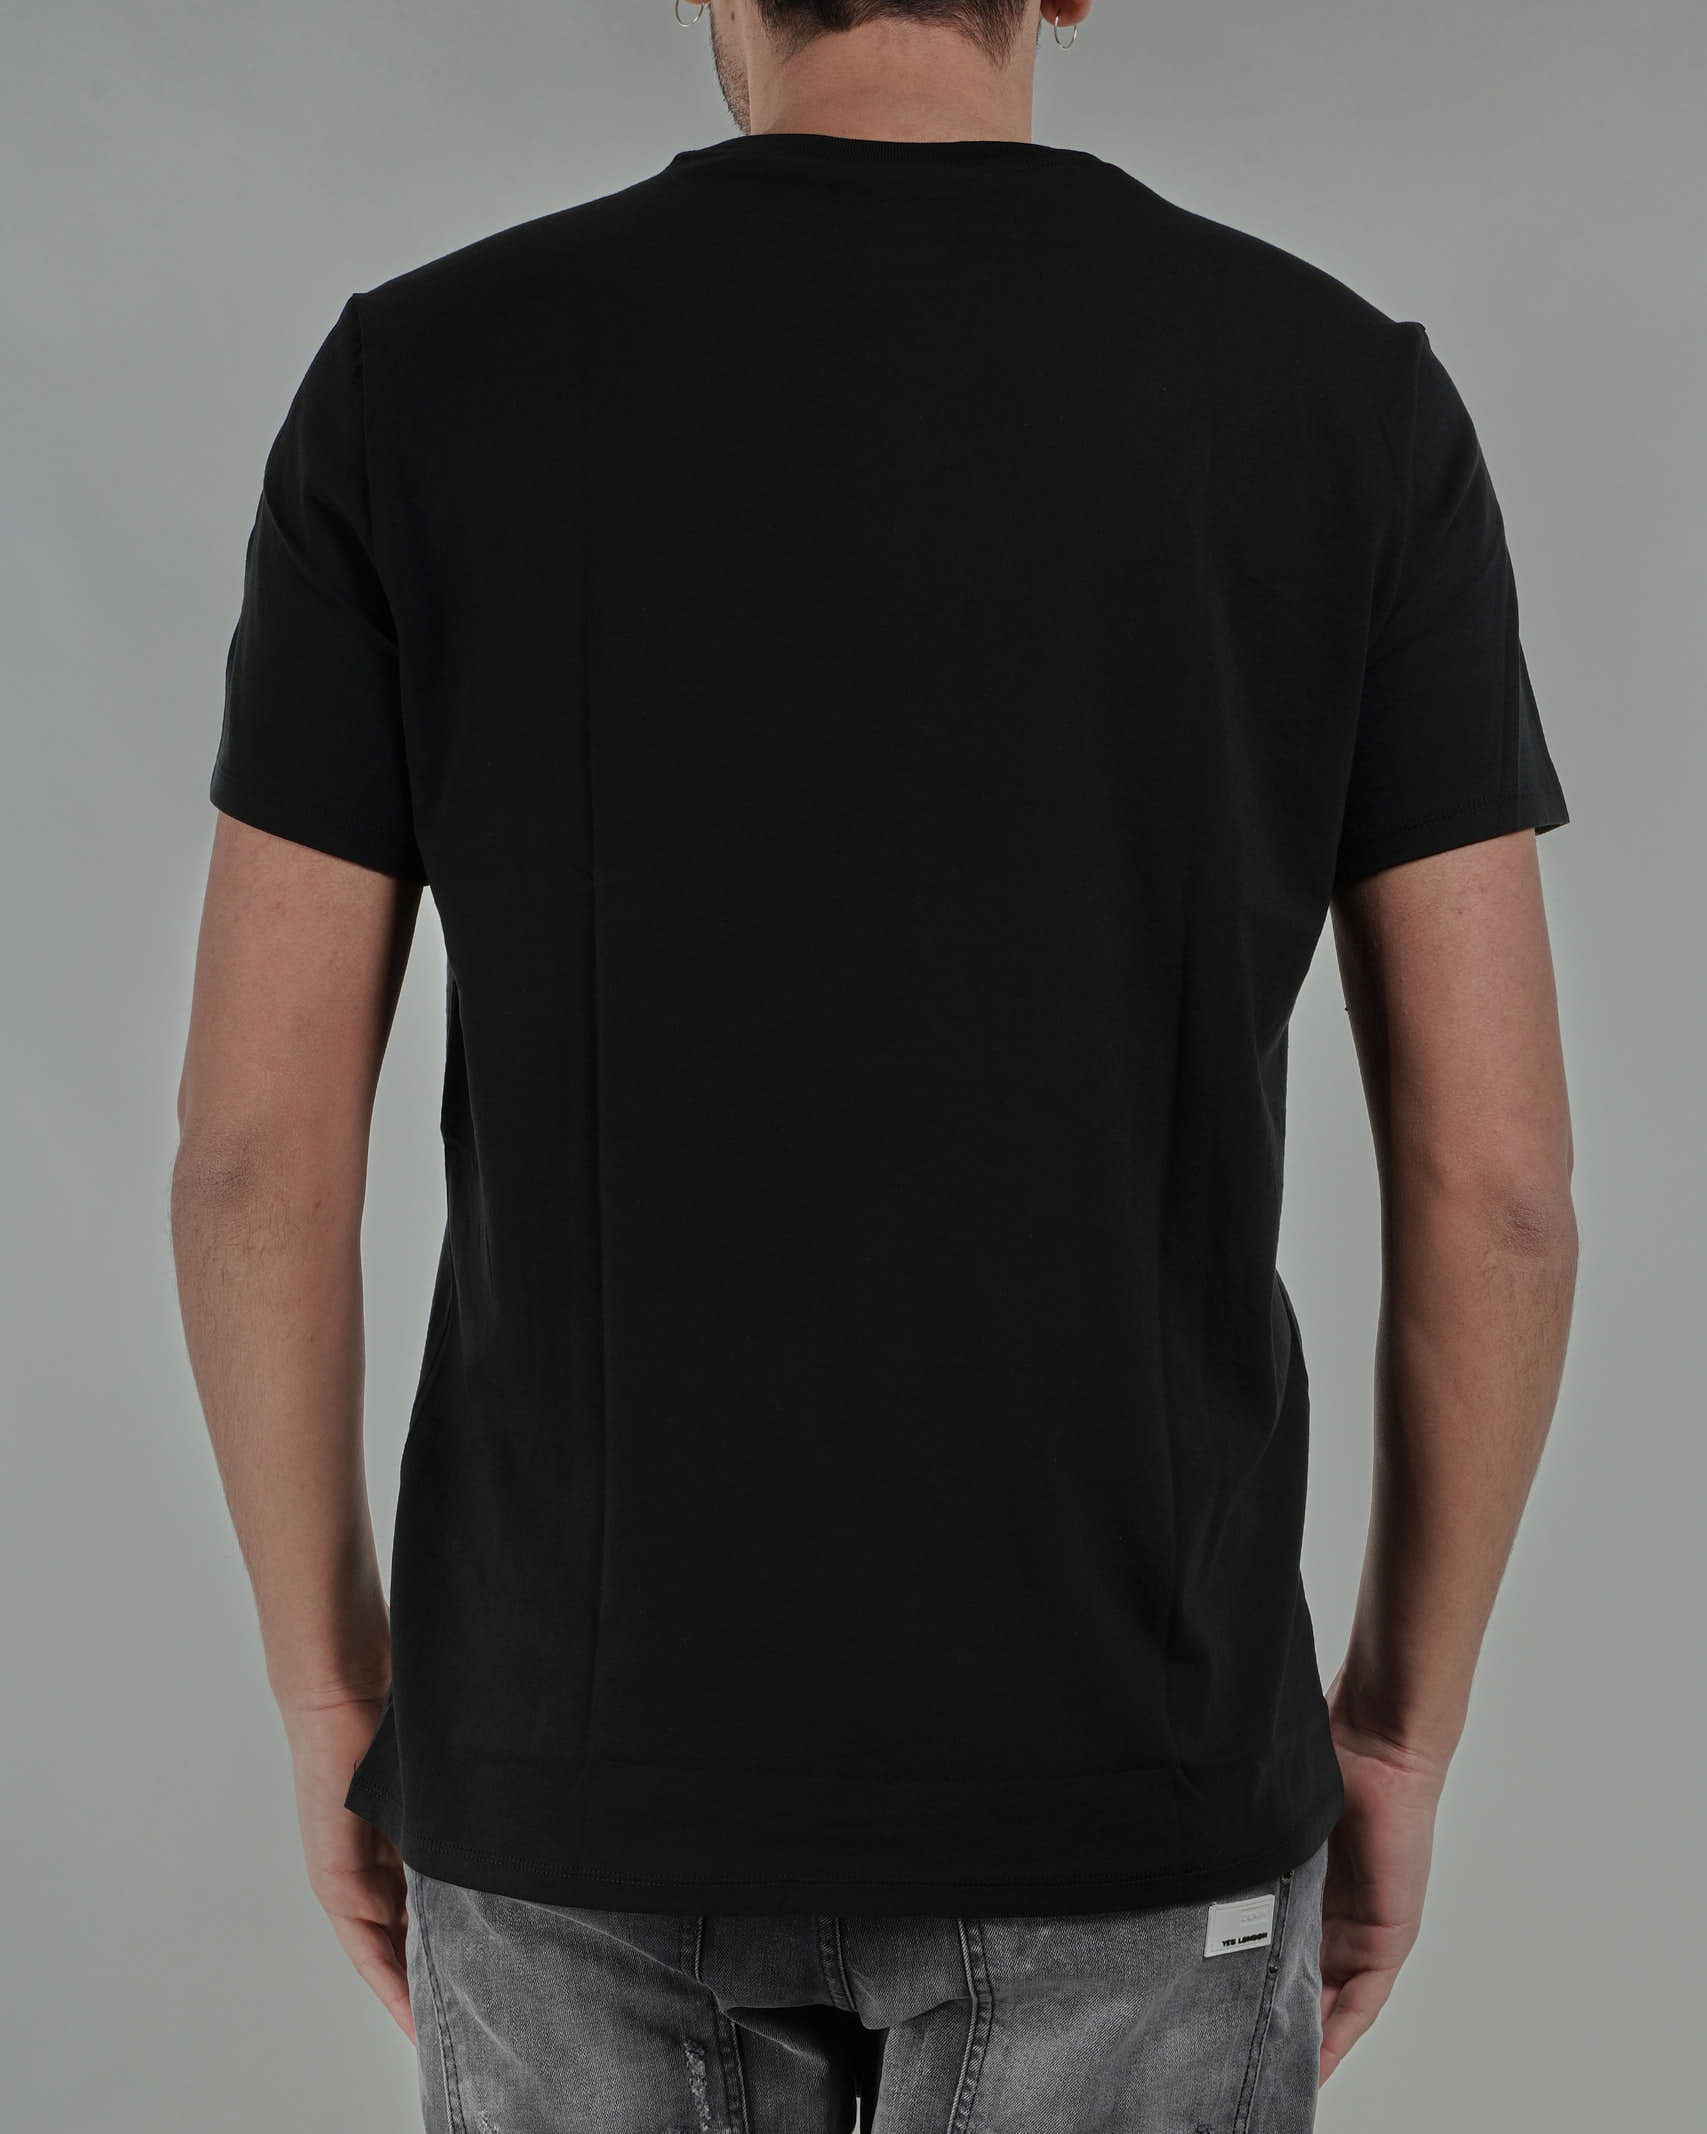 T-shirt in jersey di cotone Pima Lacoste LACOSTE   T-shirt   TH6709031